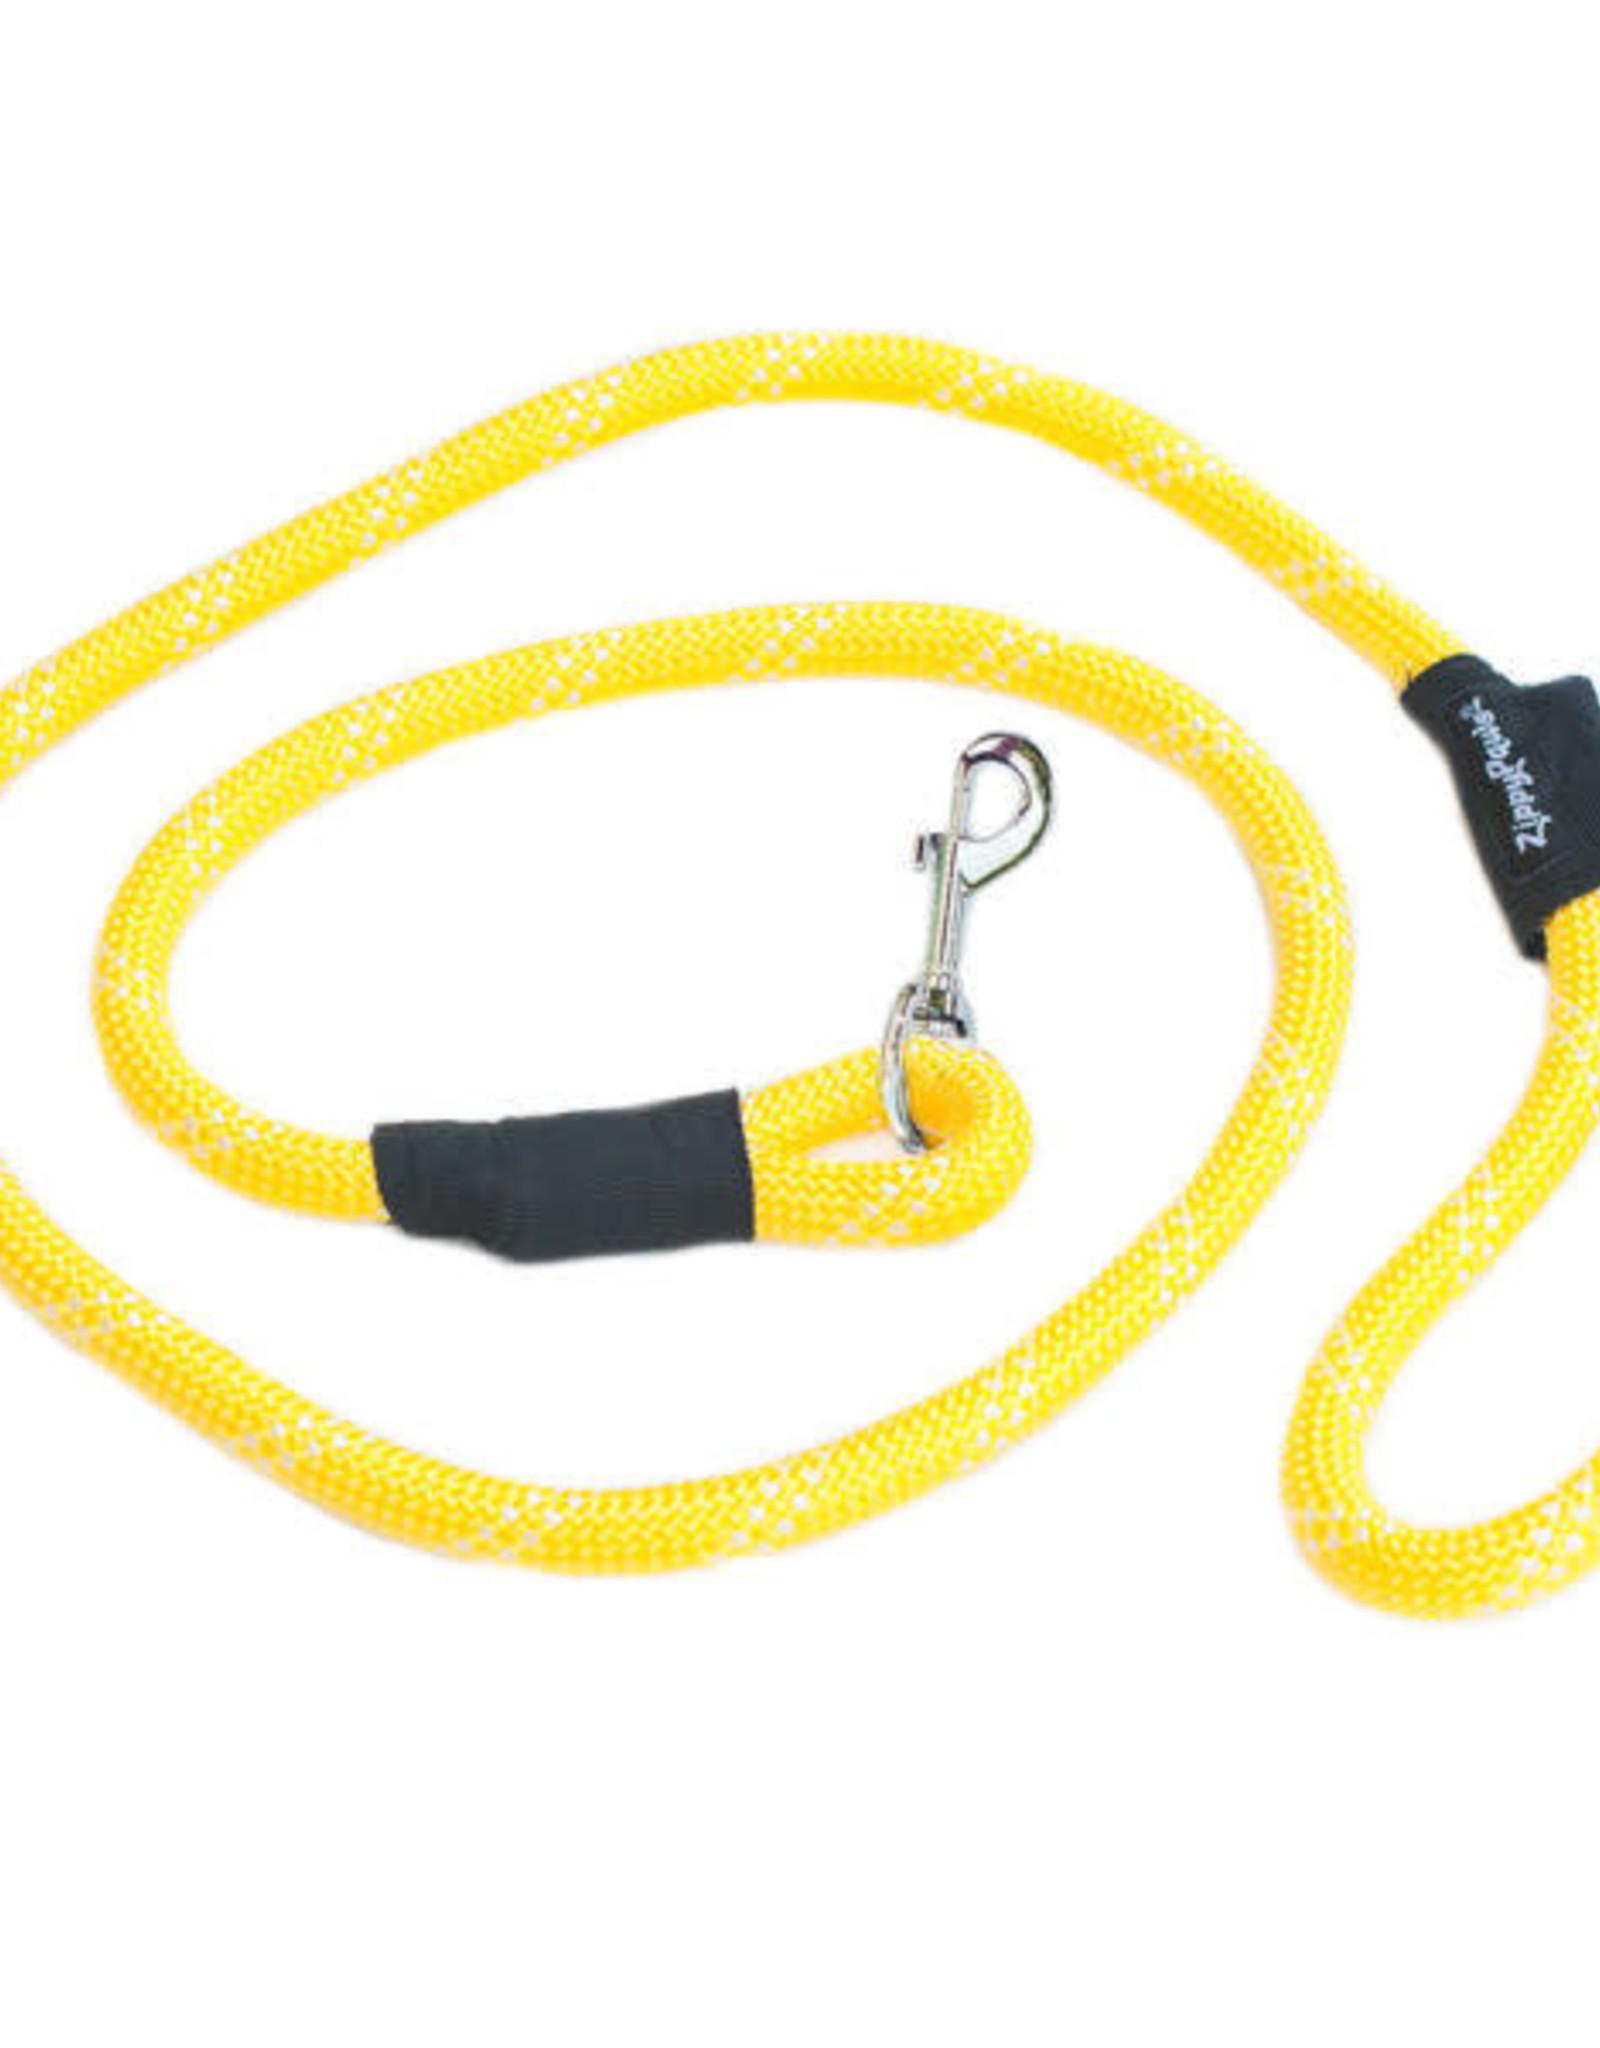 Zippy Paws Zippy Paws  Climber Leash Original  Yellow 6 FT